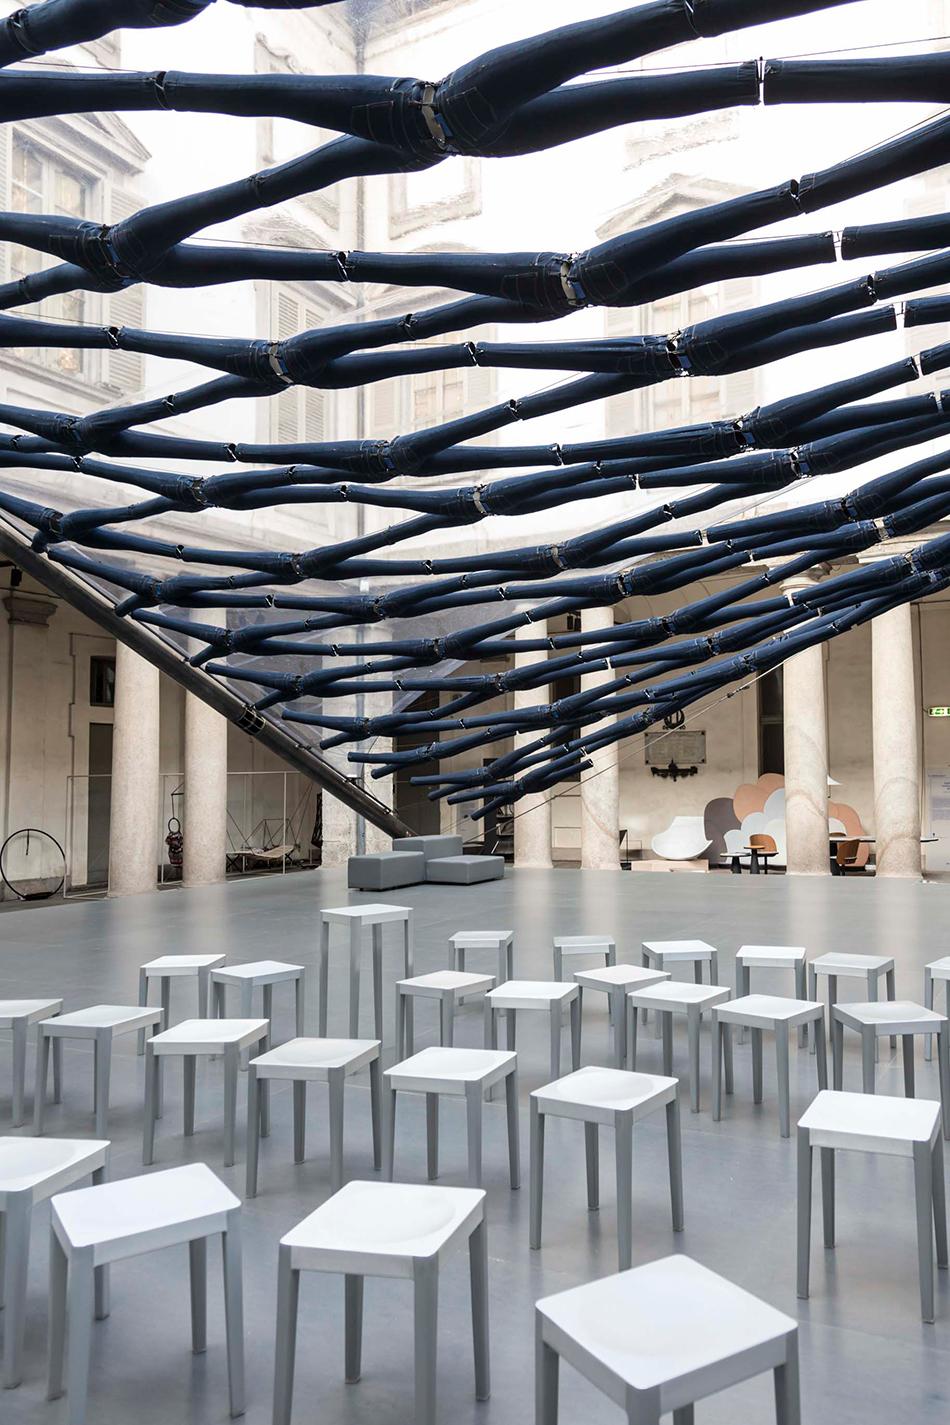 diller scofidio renfro off the cuff jean canopy palazzo litta milan design week designboom 05